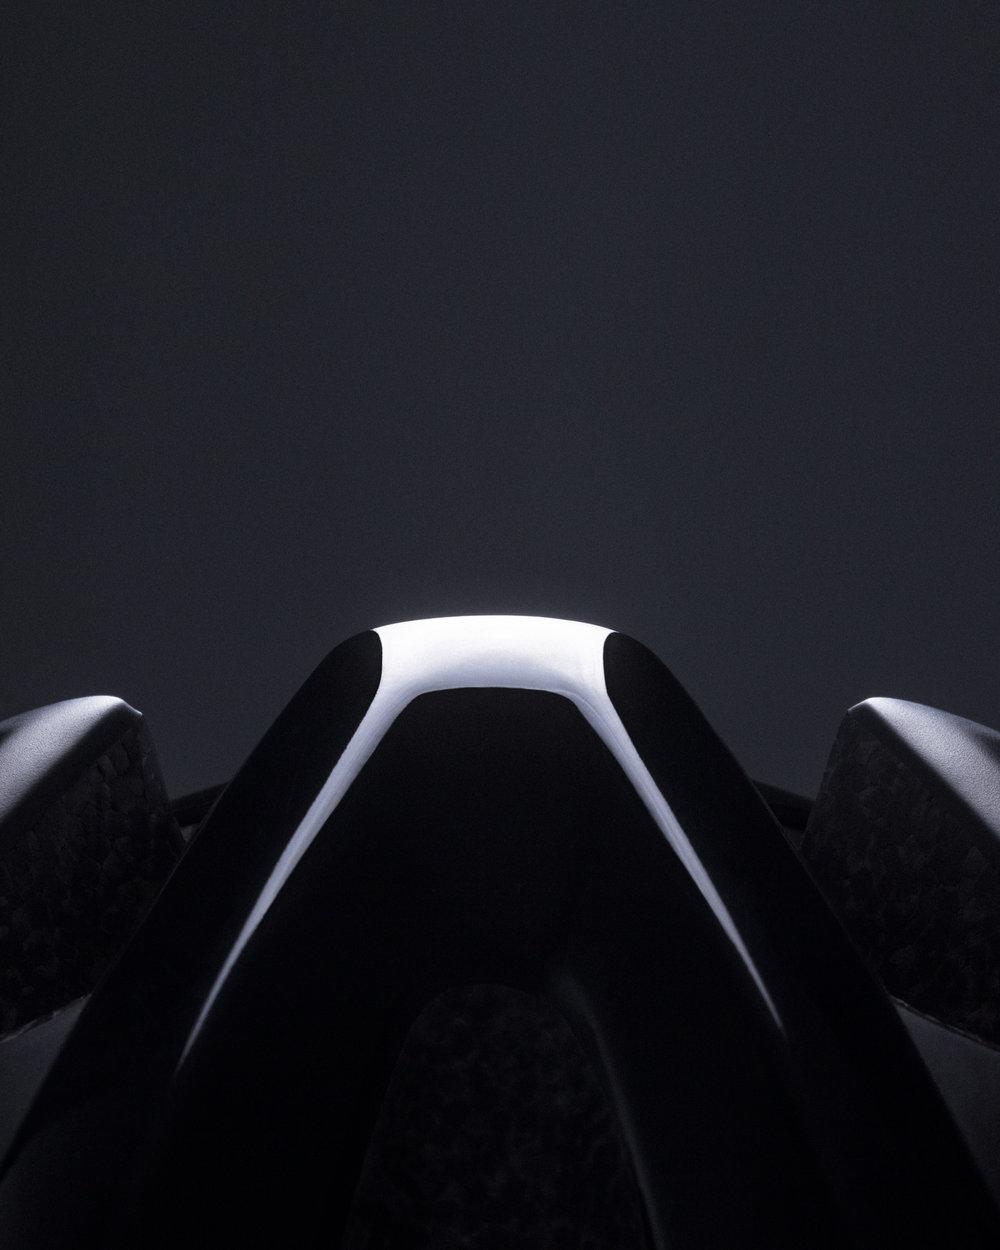 Rapha-Helmet-4316.jpg